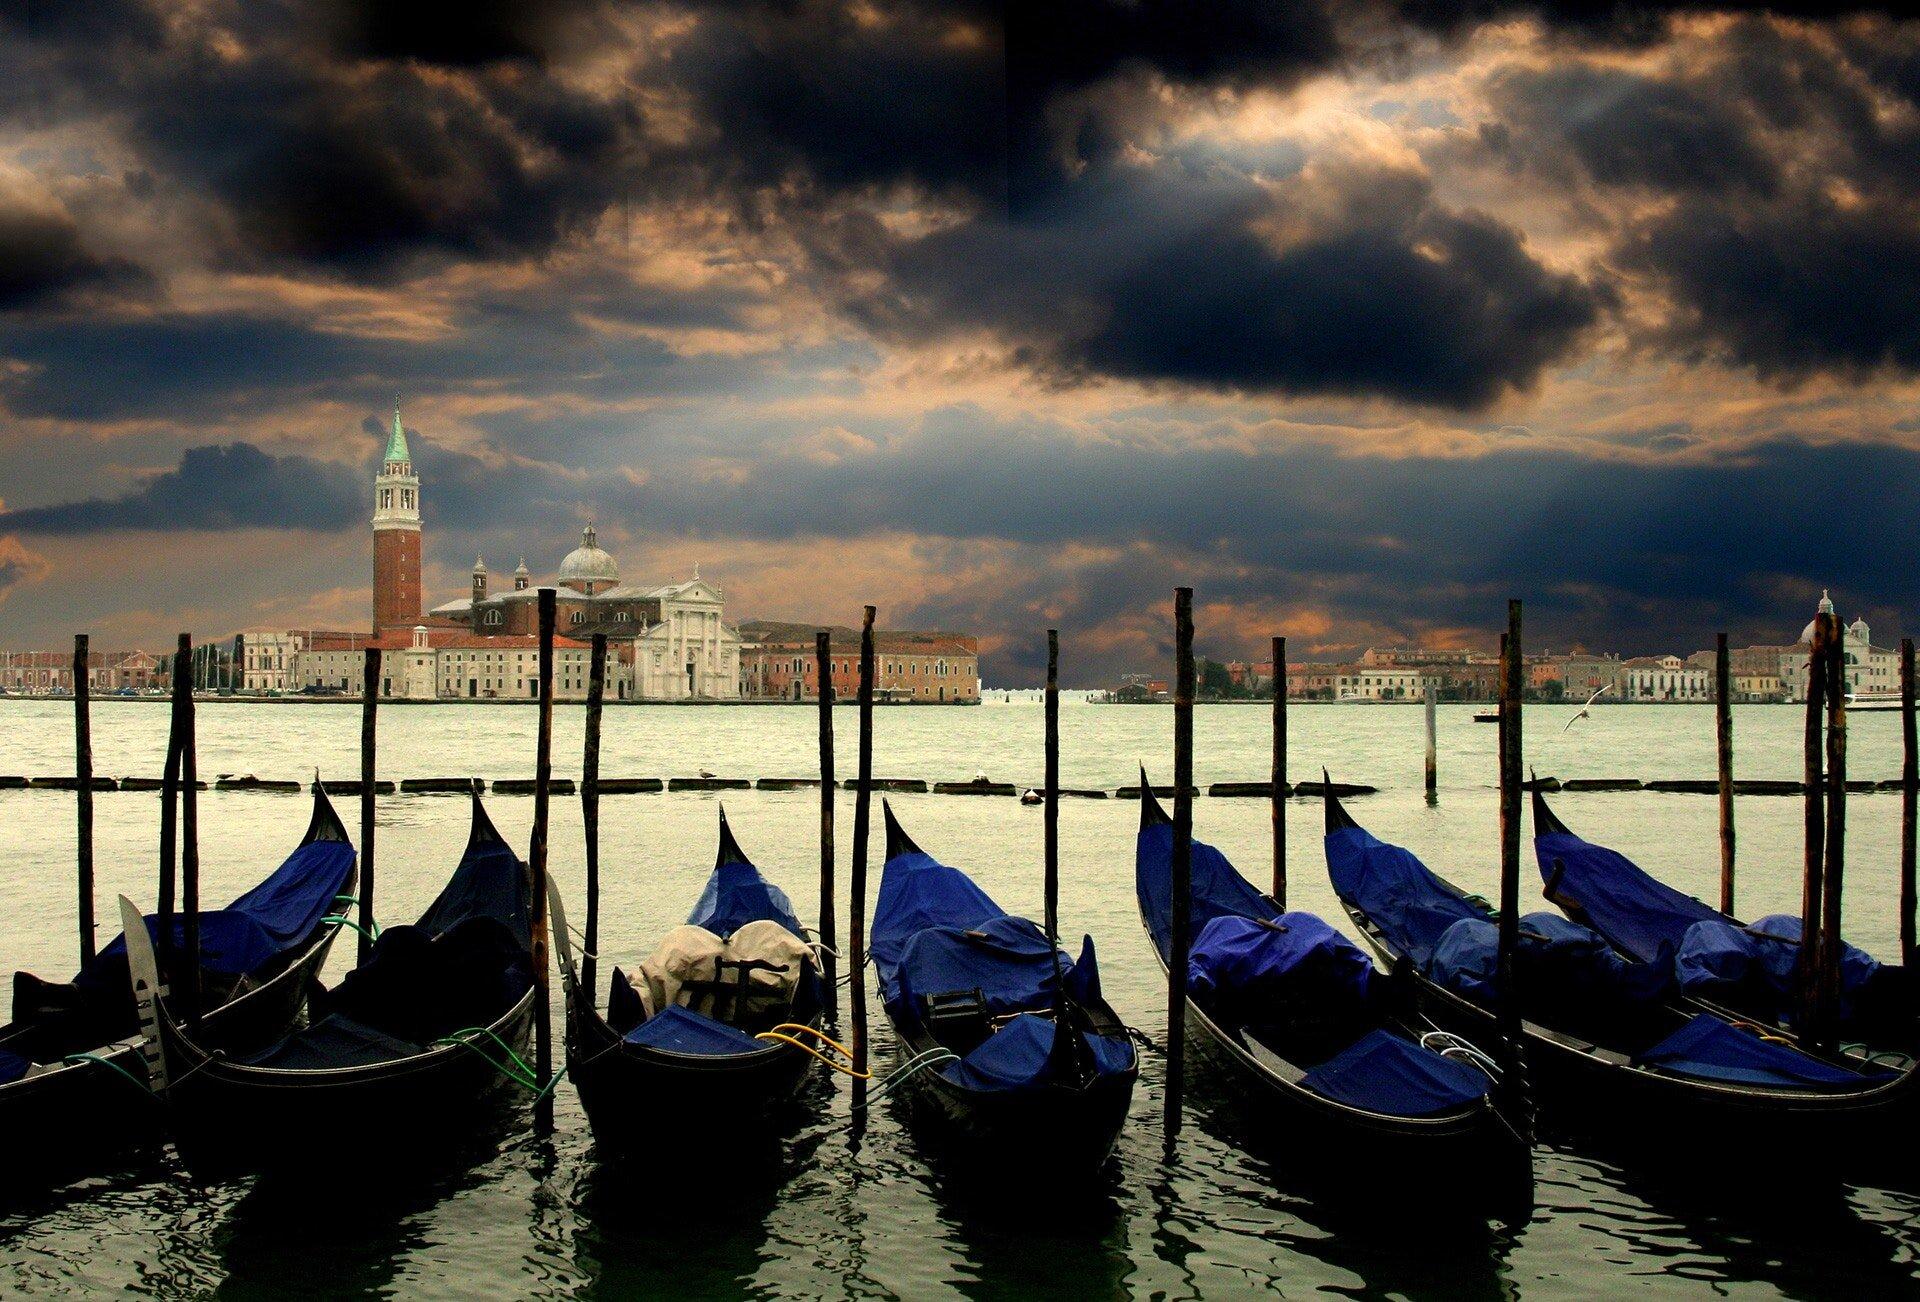 boats-city-gondolas-65606 copy.jpg